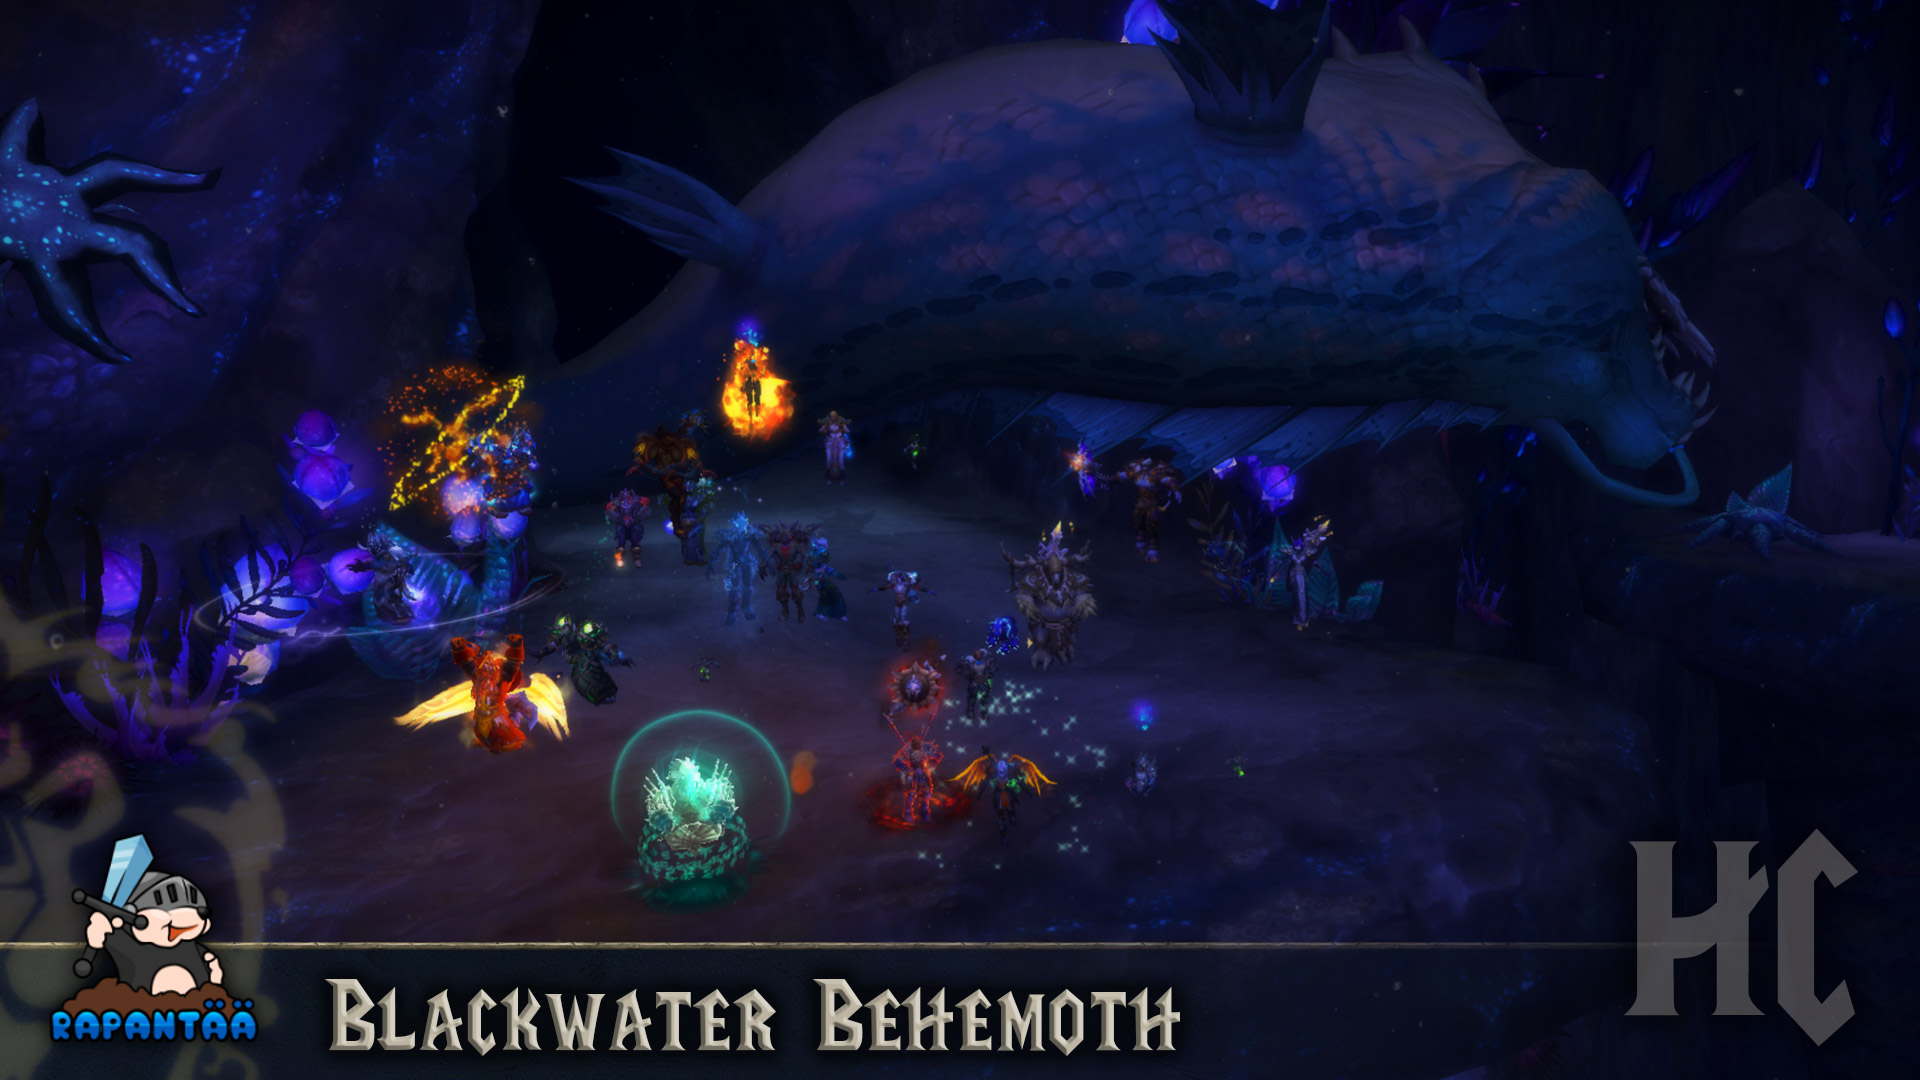 blackwater-behemoth-11.07.2019